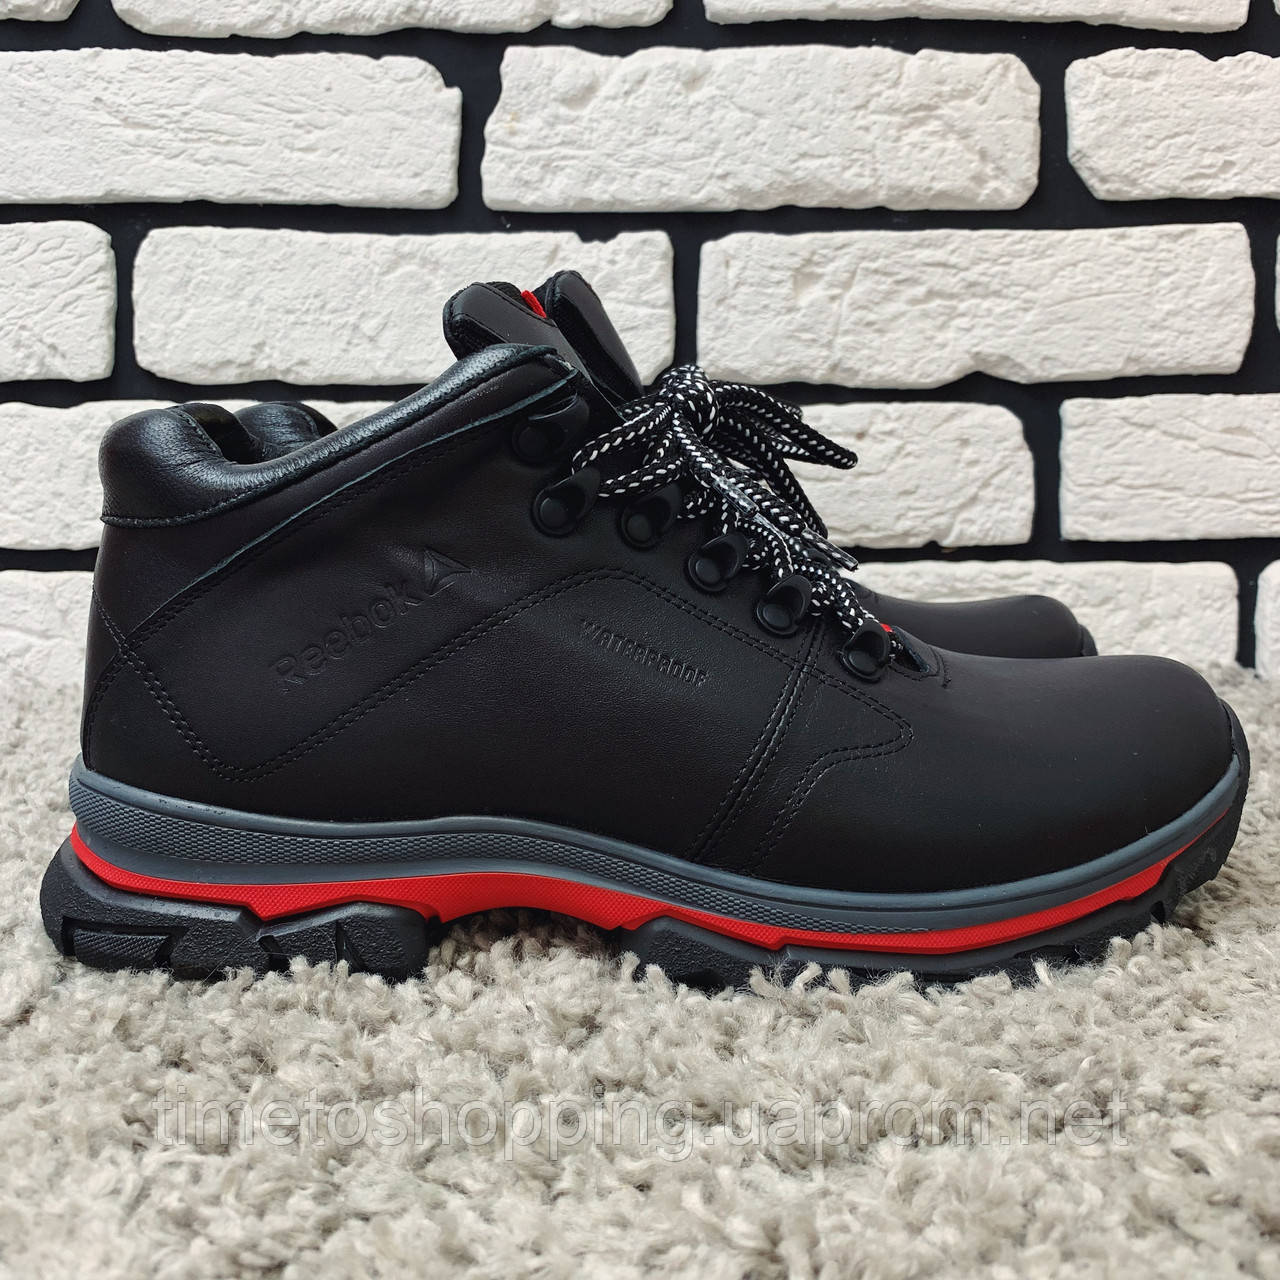 Зимние ботинки (на меху) мужские Reebok  13060 ⏩РАЗМЕР  [41,45 ]